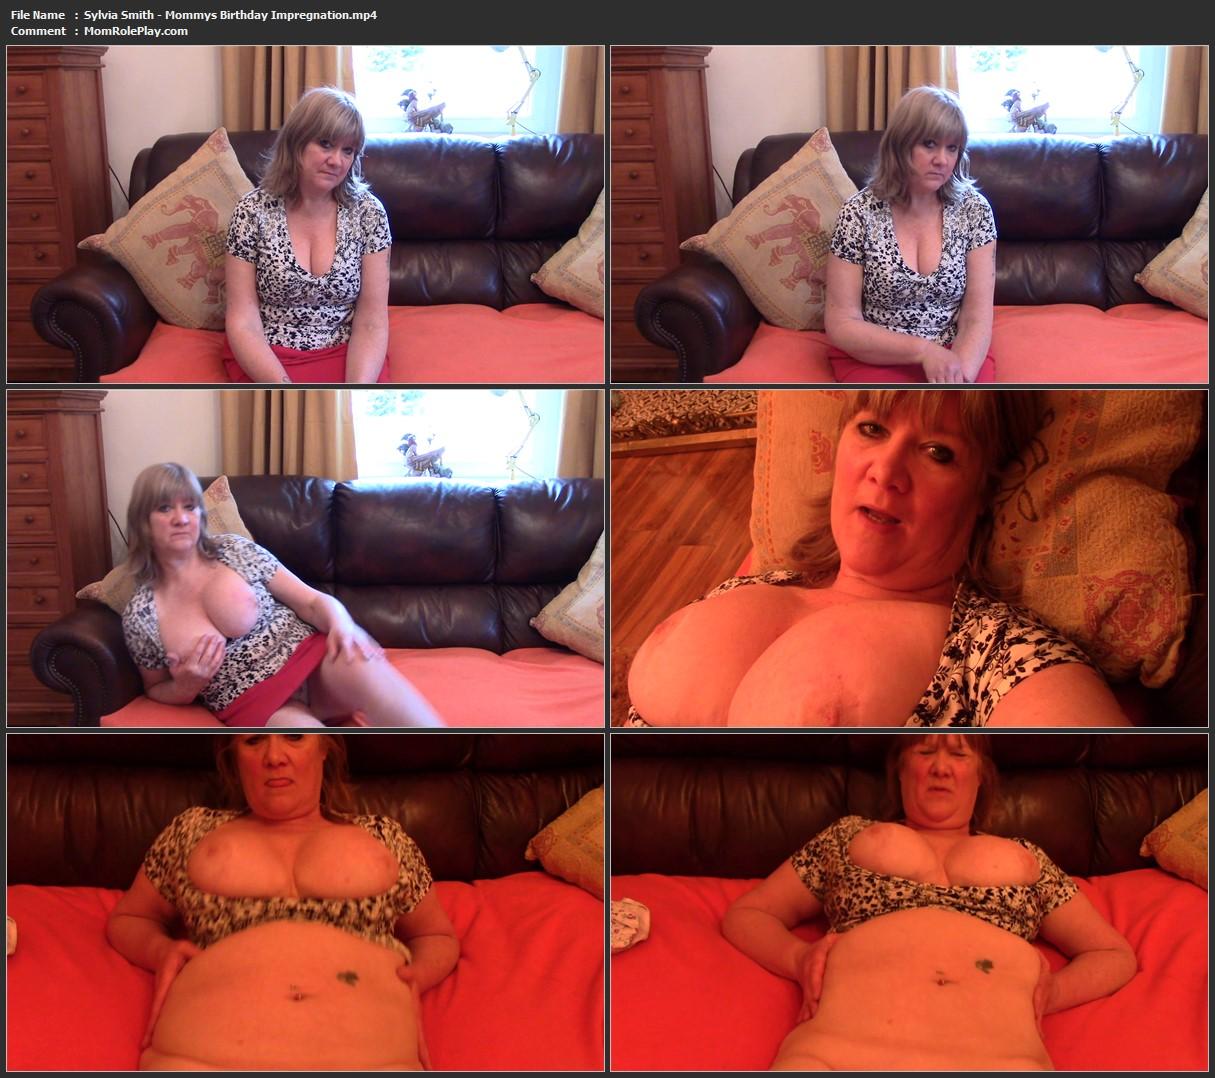 Sylvia Smith - Mommys Birthday Impregnation